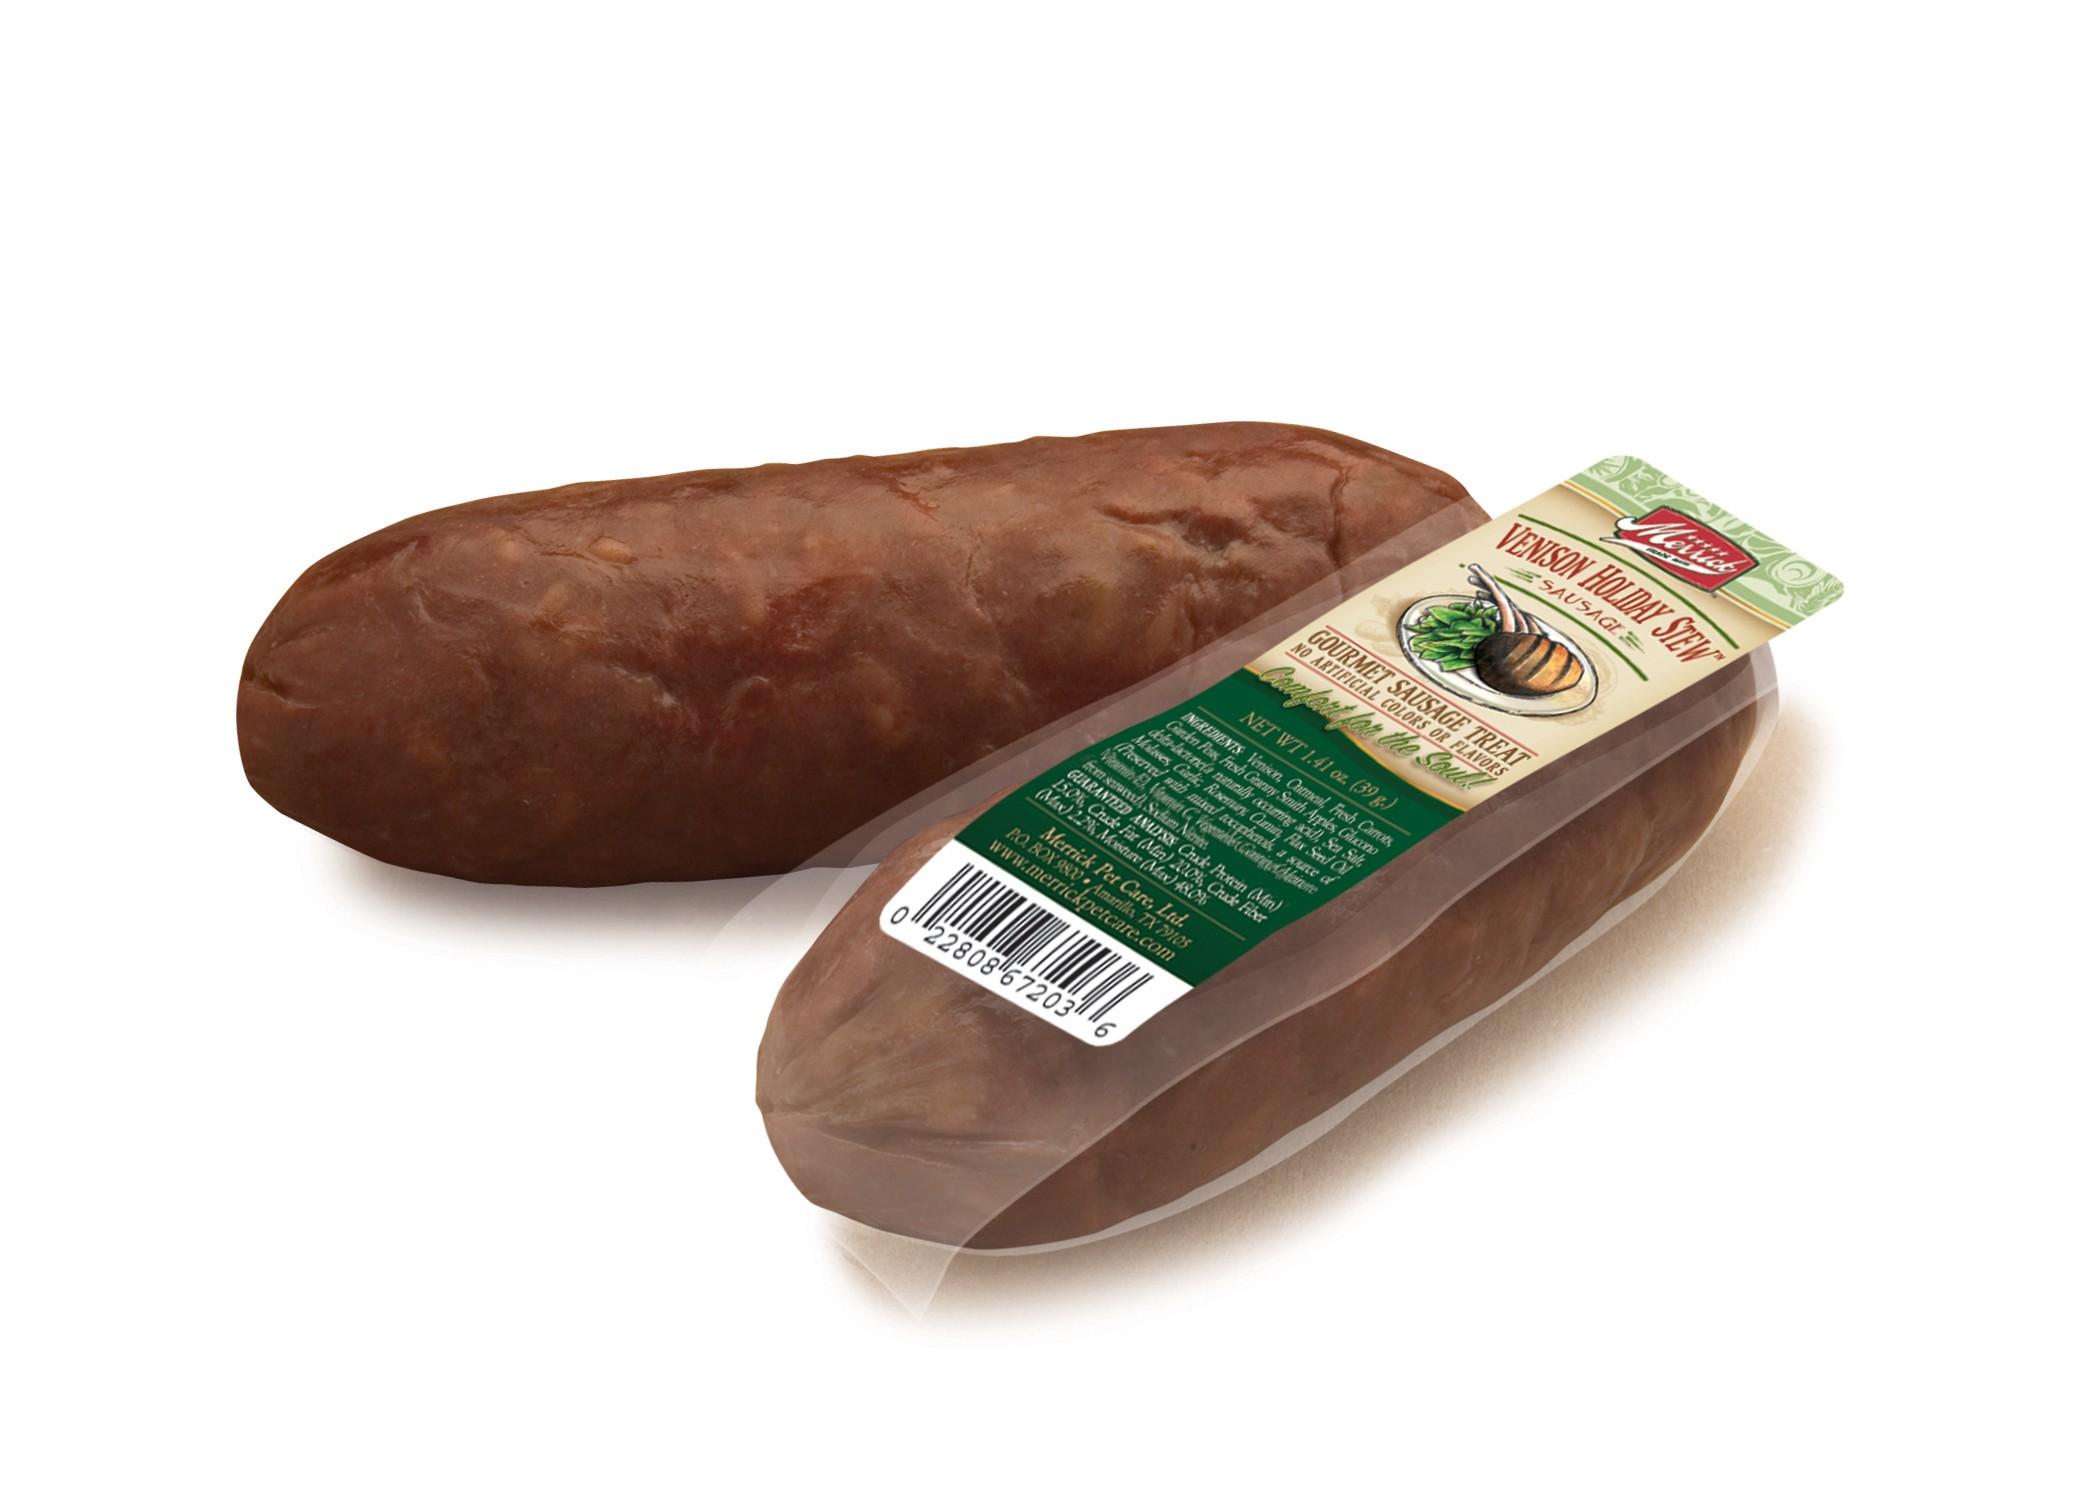 merrick venison holiday stew sausage dog treat case of 34. Black Bedroom Furniture Sets. Home Design Ideas